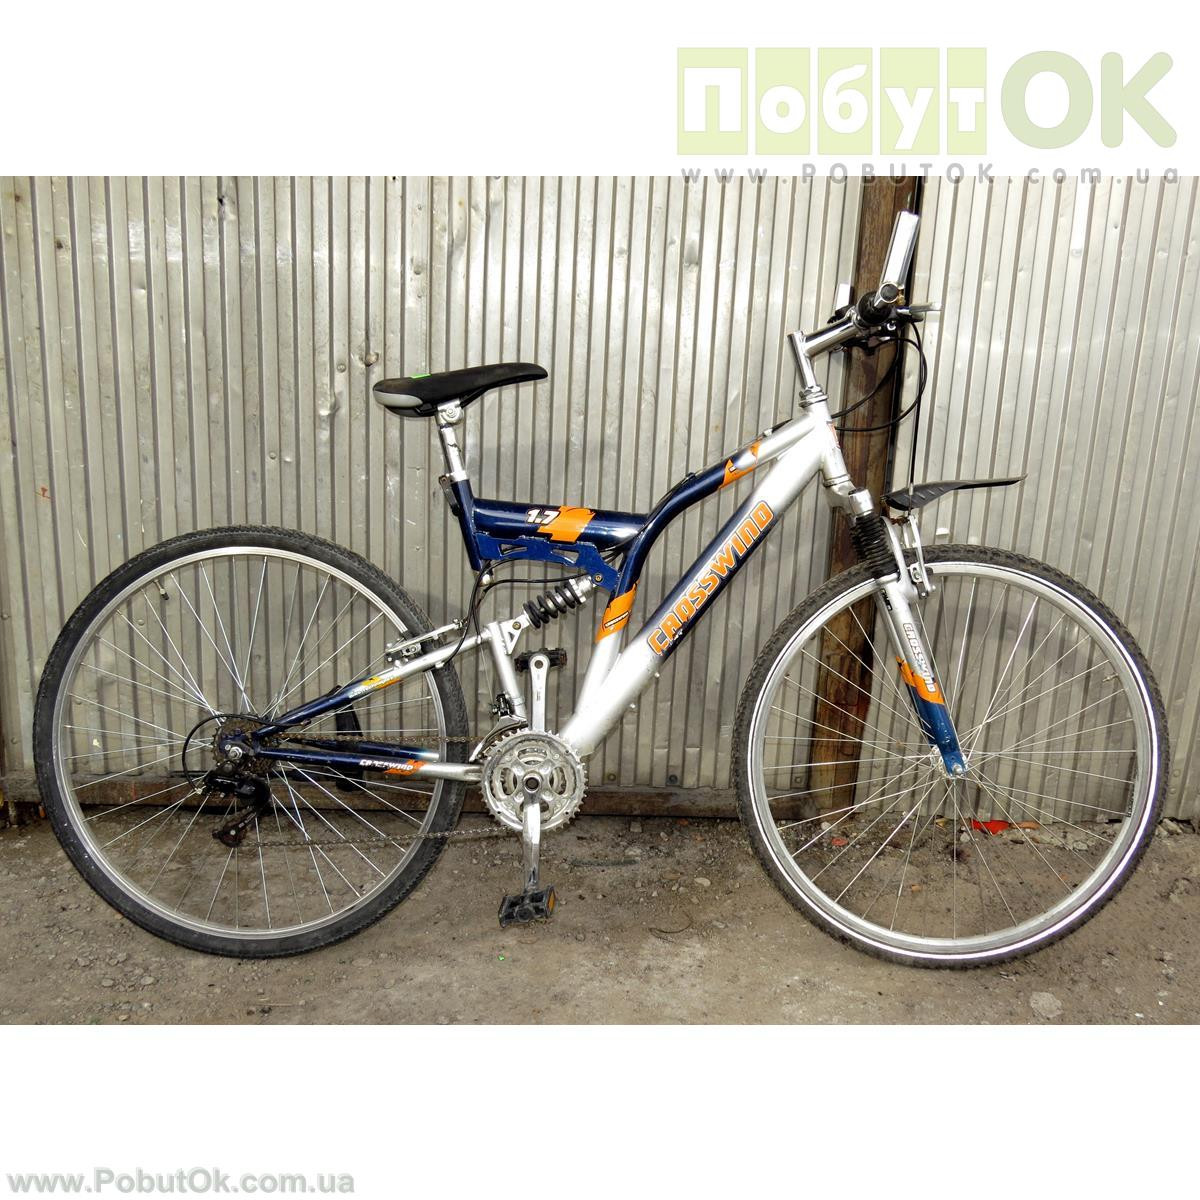 Велосипед CROSSWIND 1.7 (Код:0907) Состояние: Б/У